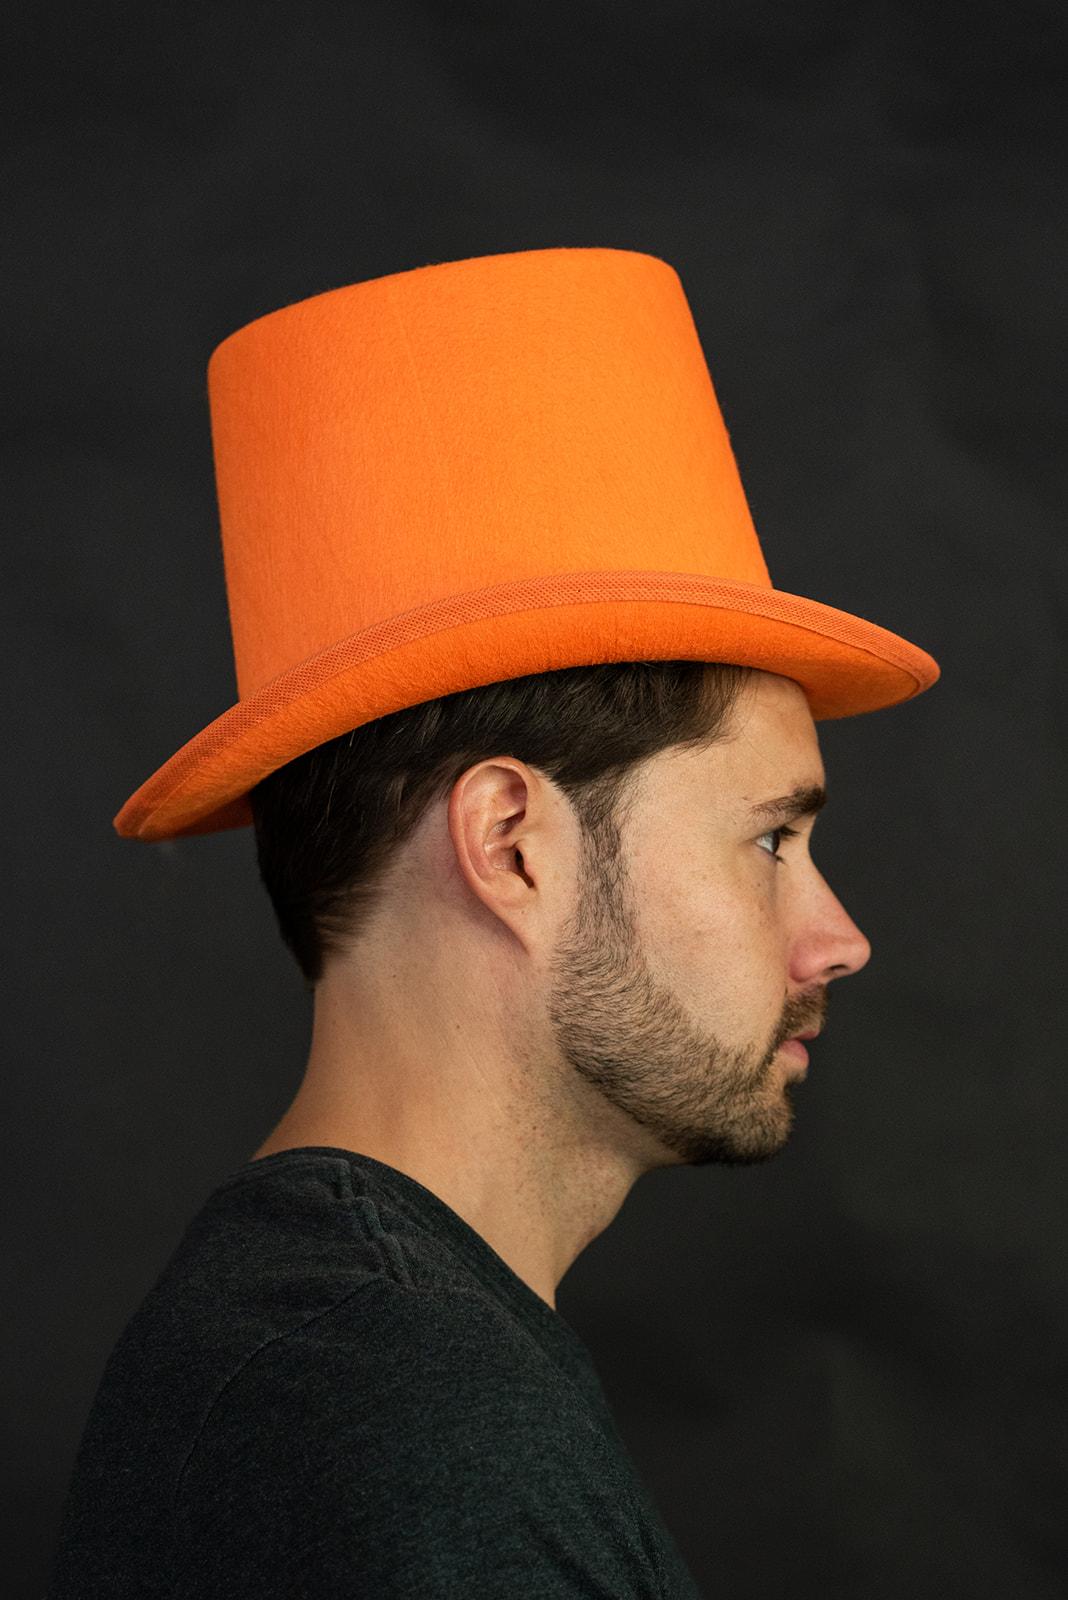 thumbnail 7 - Dumb and Dumber Orange Tall  Felt Top Hat Lloyd Christmas Costume Accessory